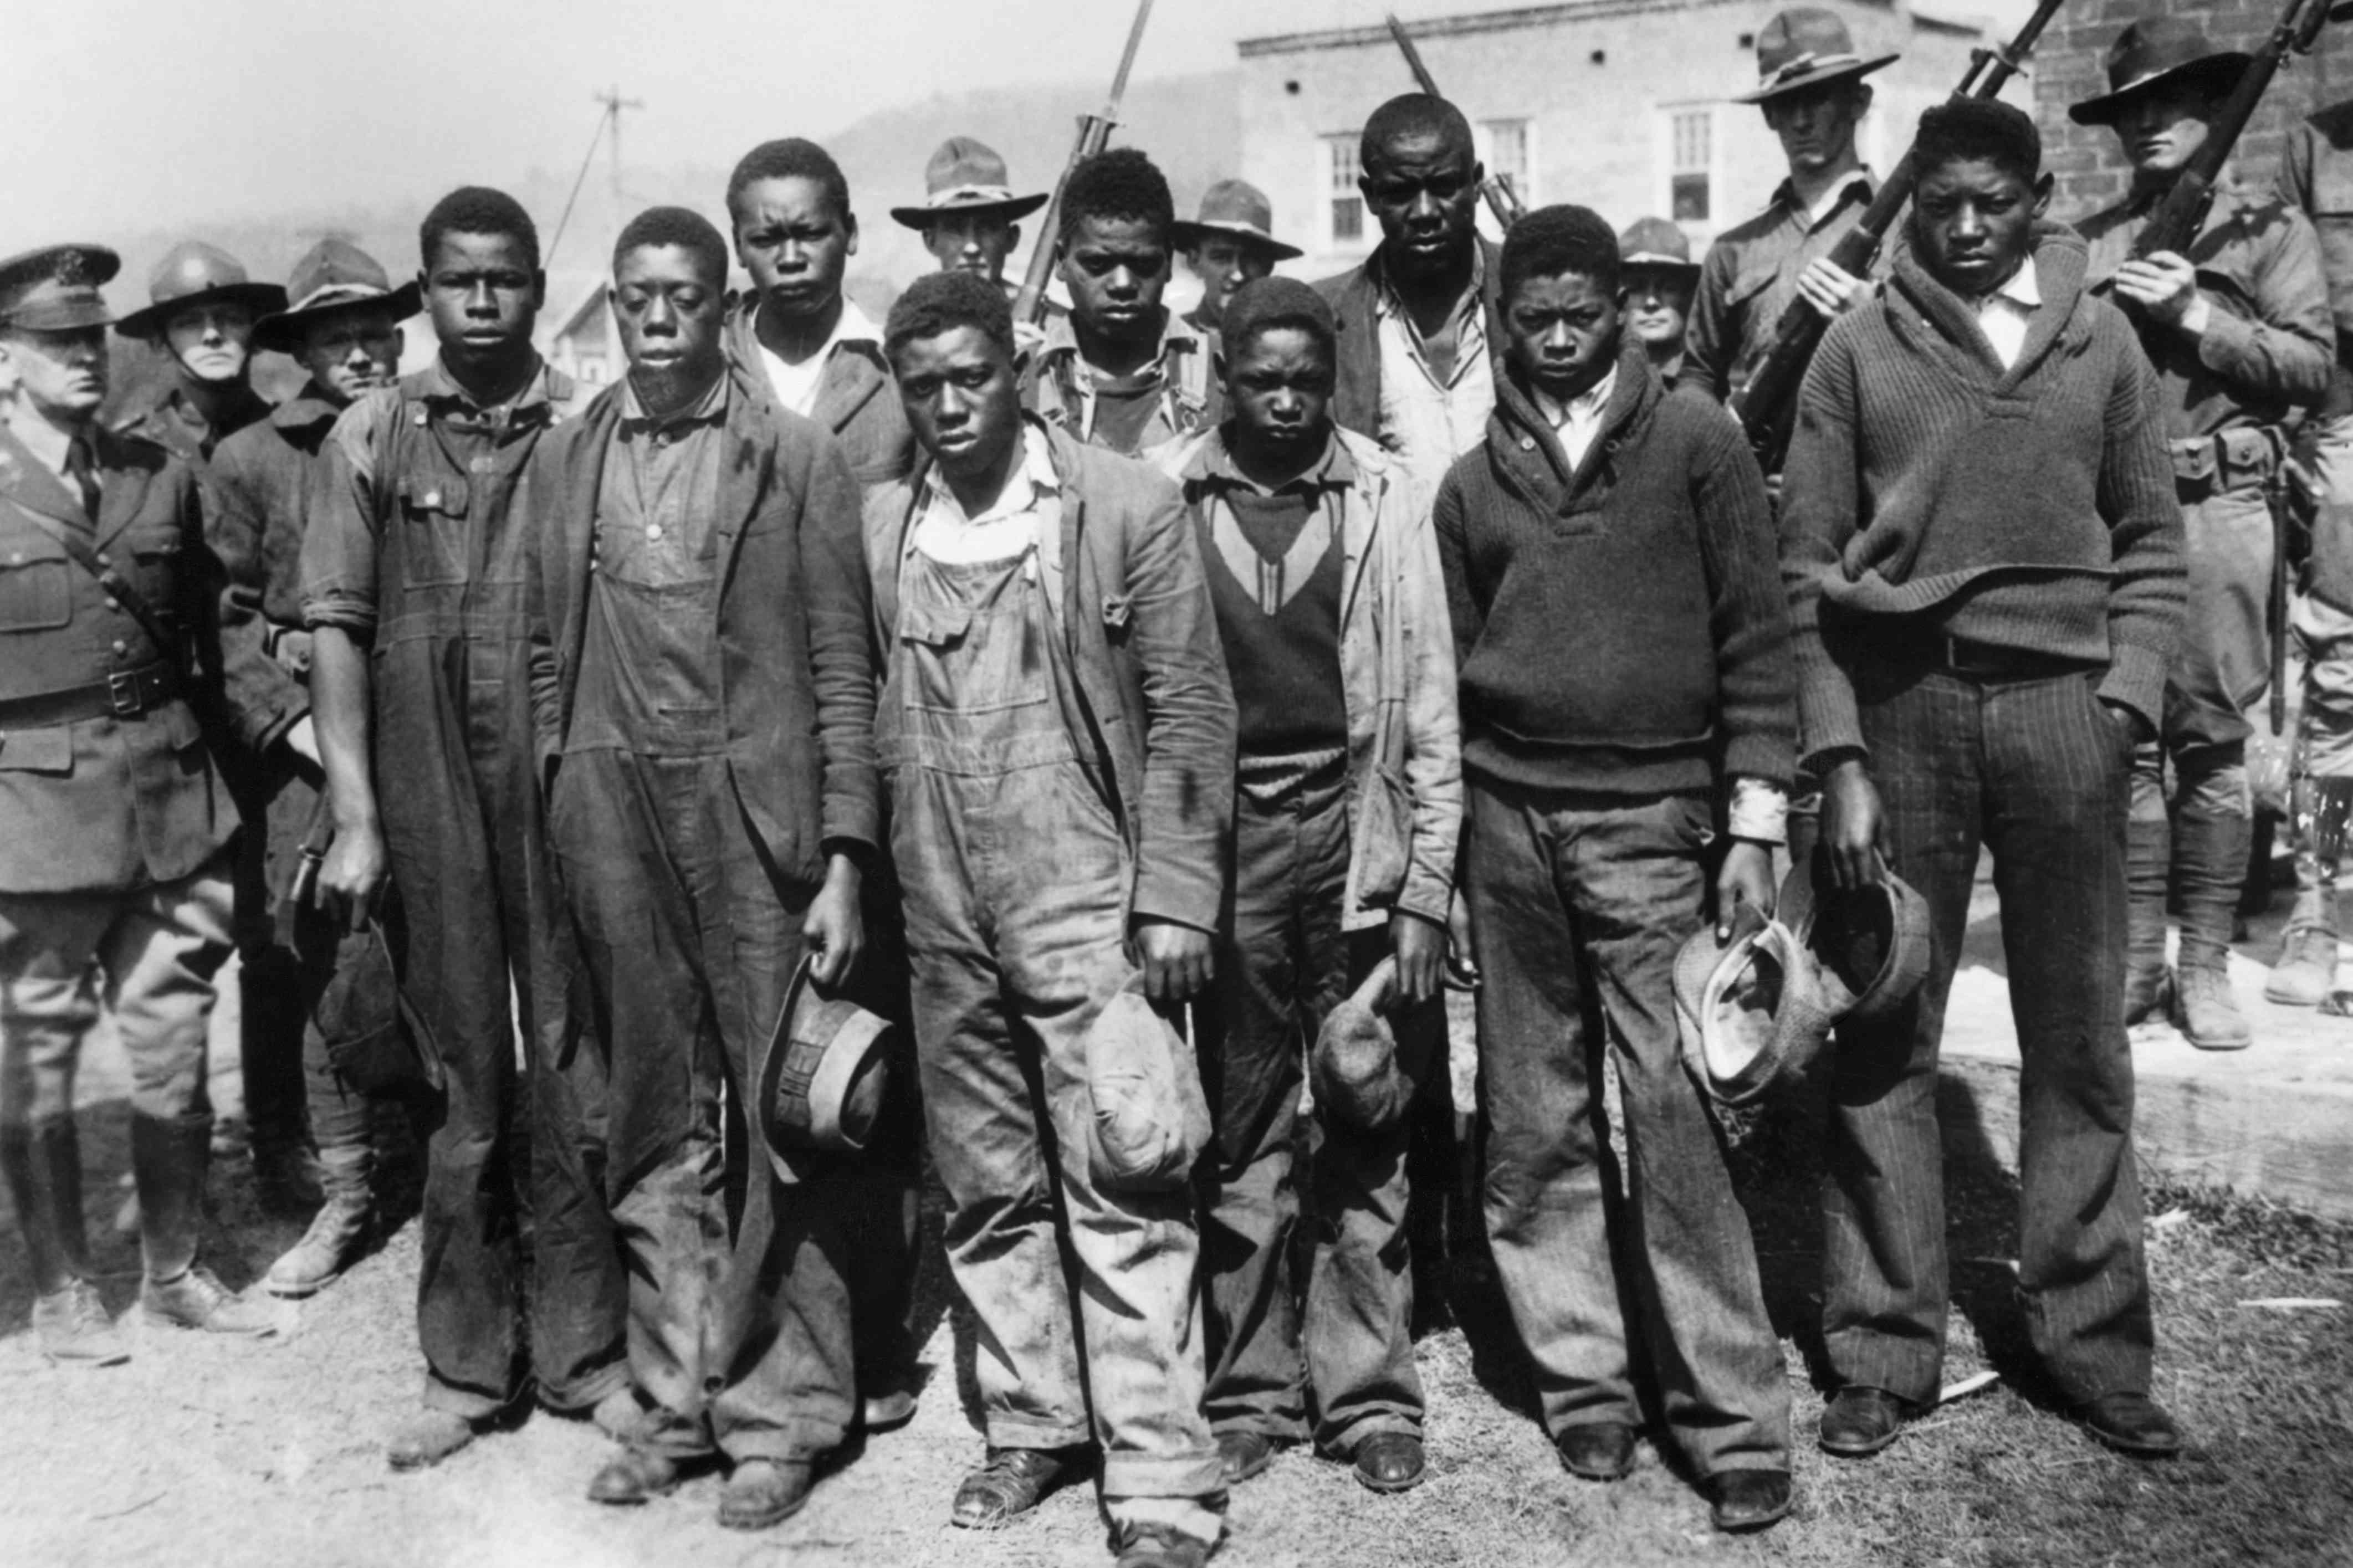 All nine Scottsboro Boys standing together